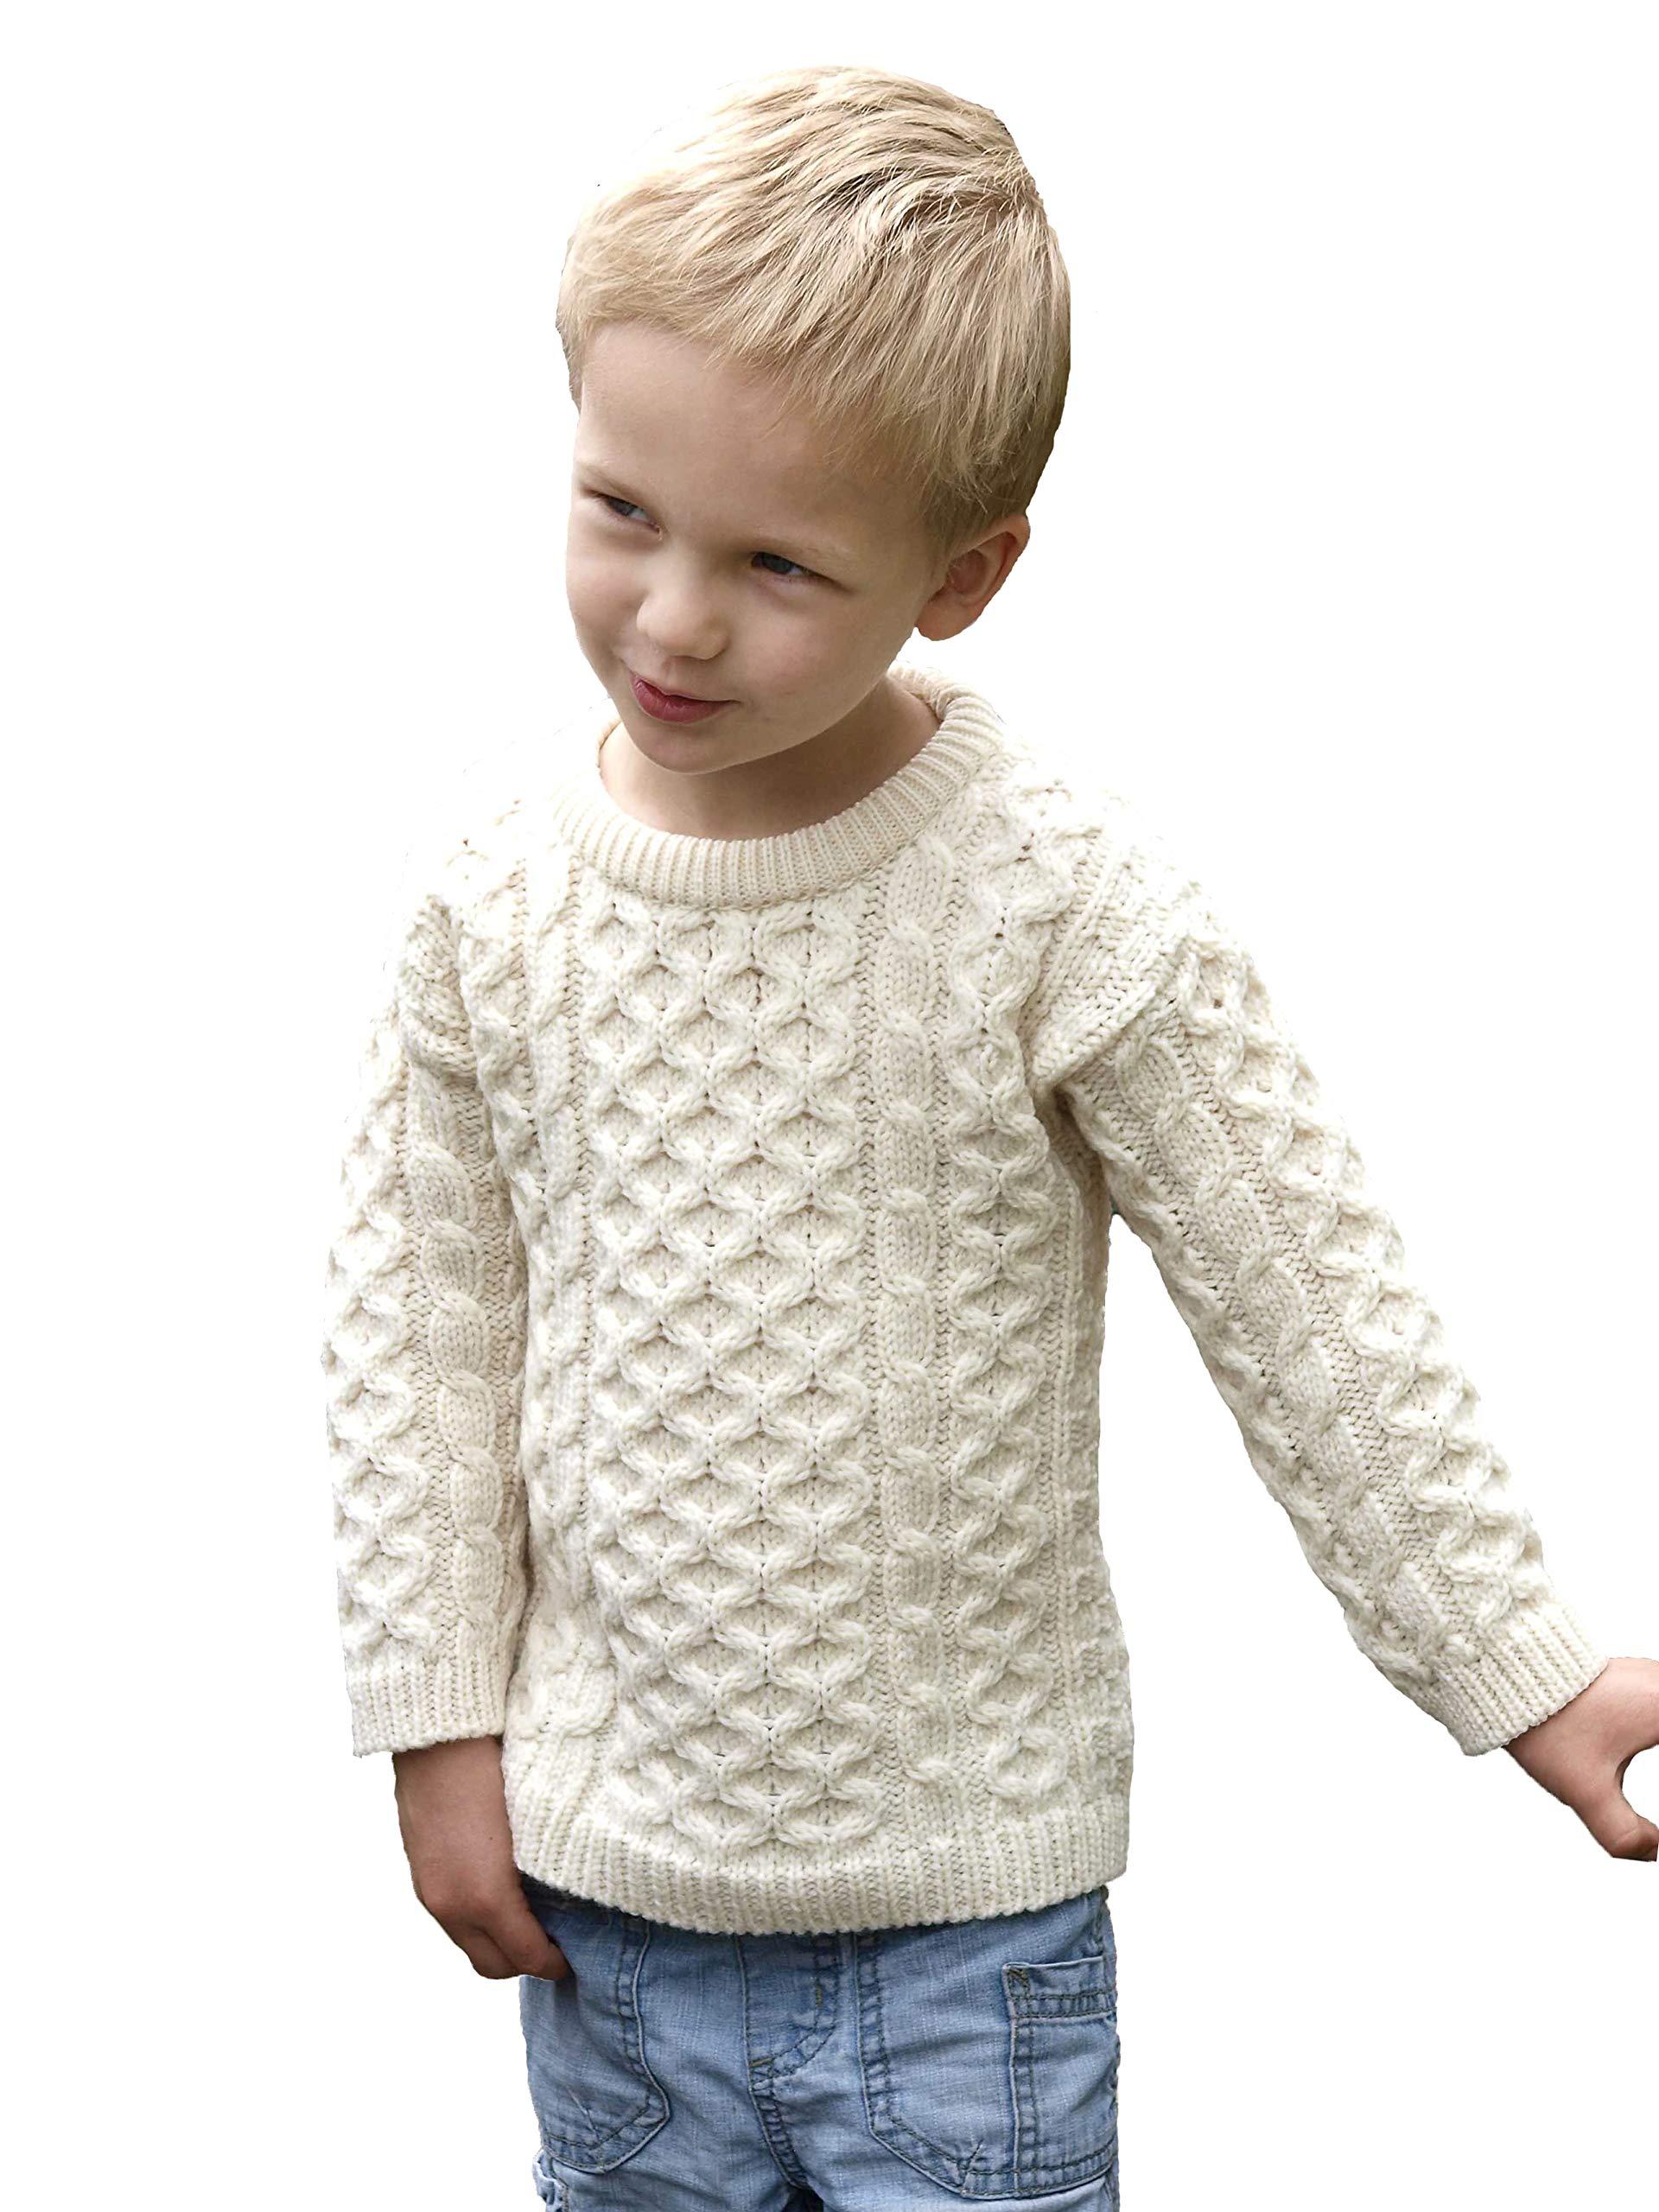 Aran Crafts Child Crew Neck Sweater 8/11 Natural (C311k-8/11-NAT)